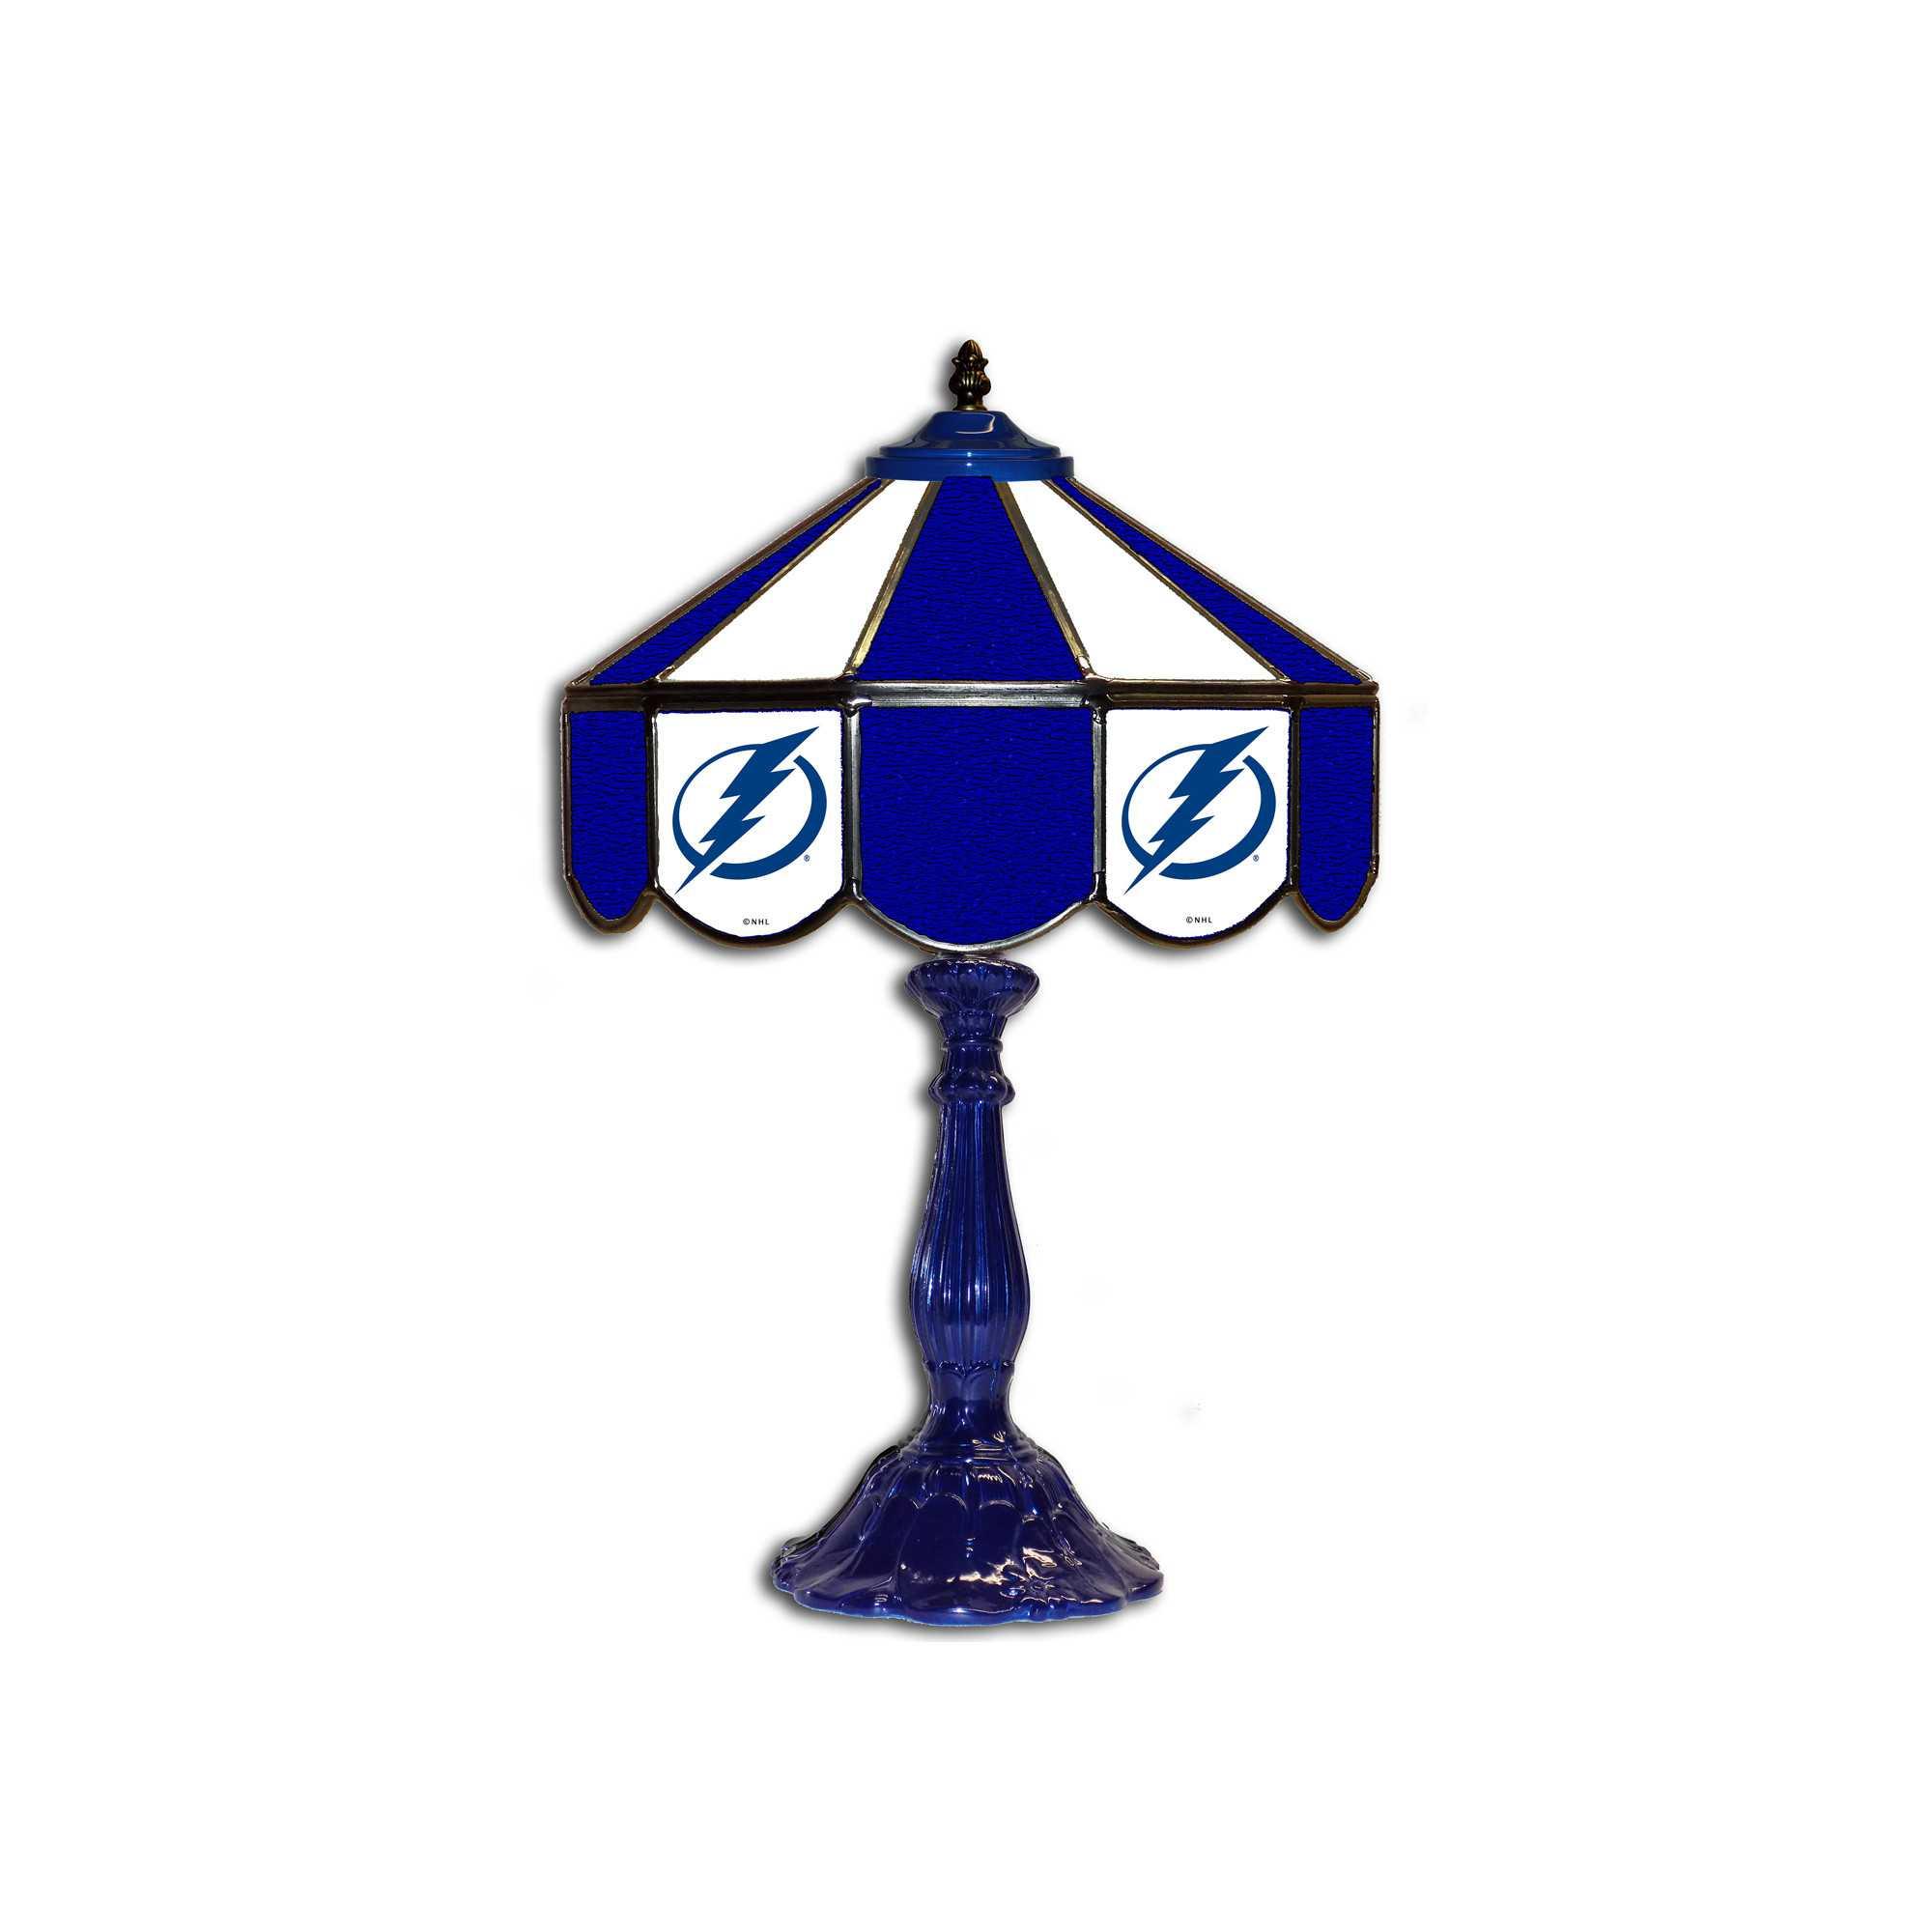 "TAMPA BAY LIGHTNING 21"" GLASS TABLE LAMP"